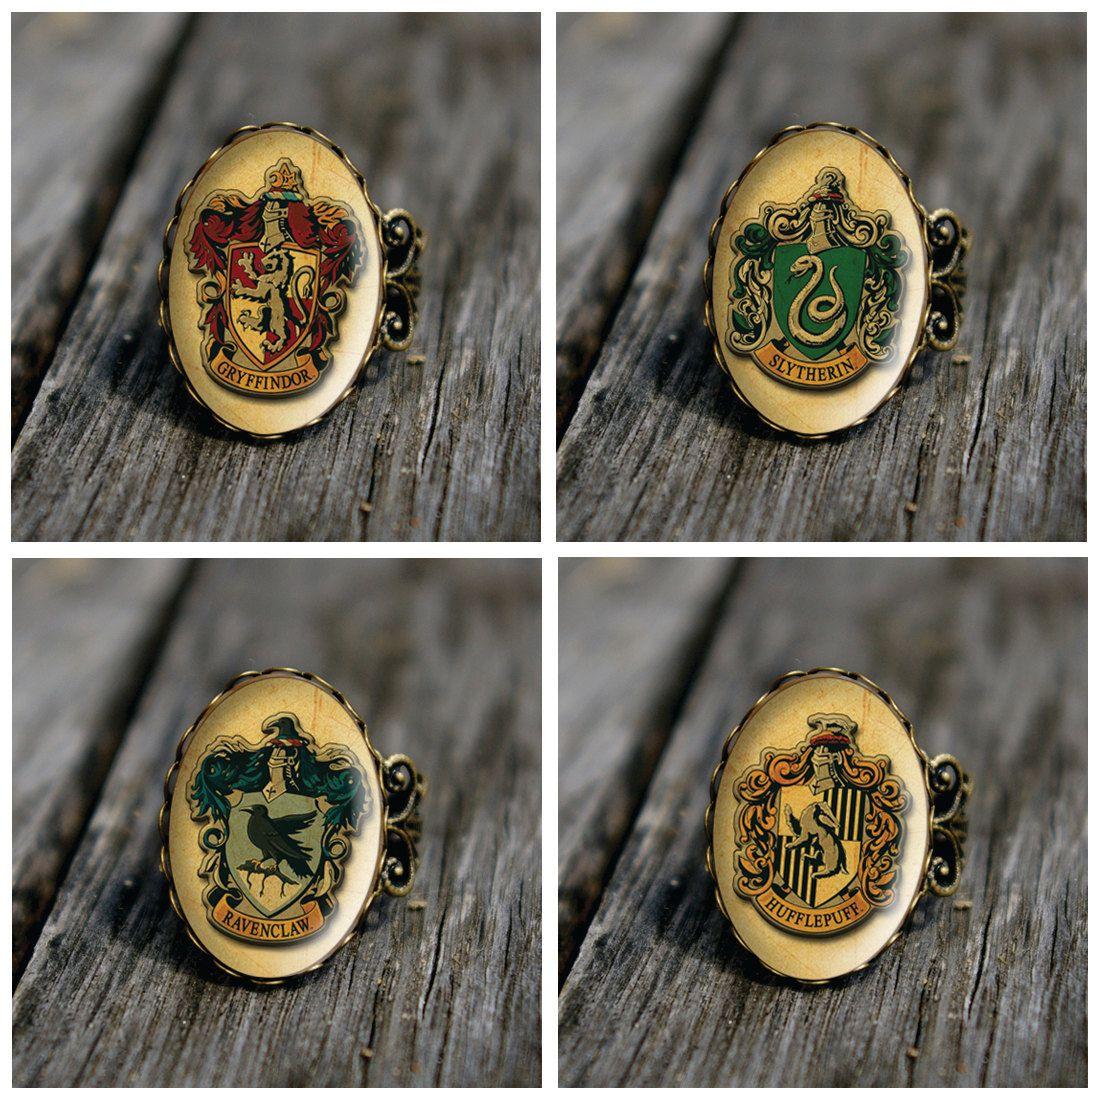 Hogwarts Houses Vintage Style Ring. $15.00